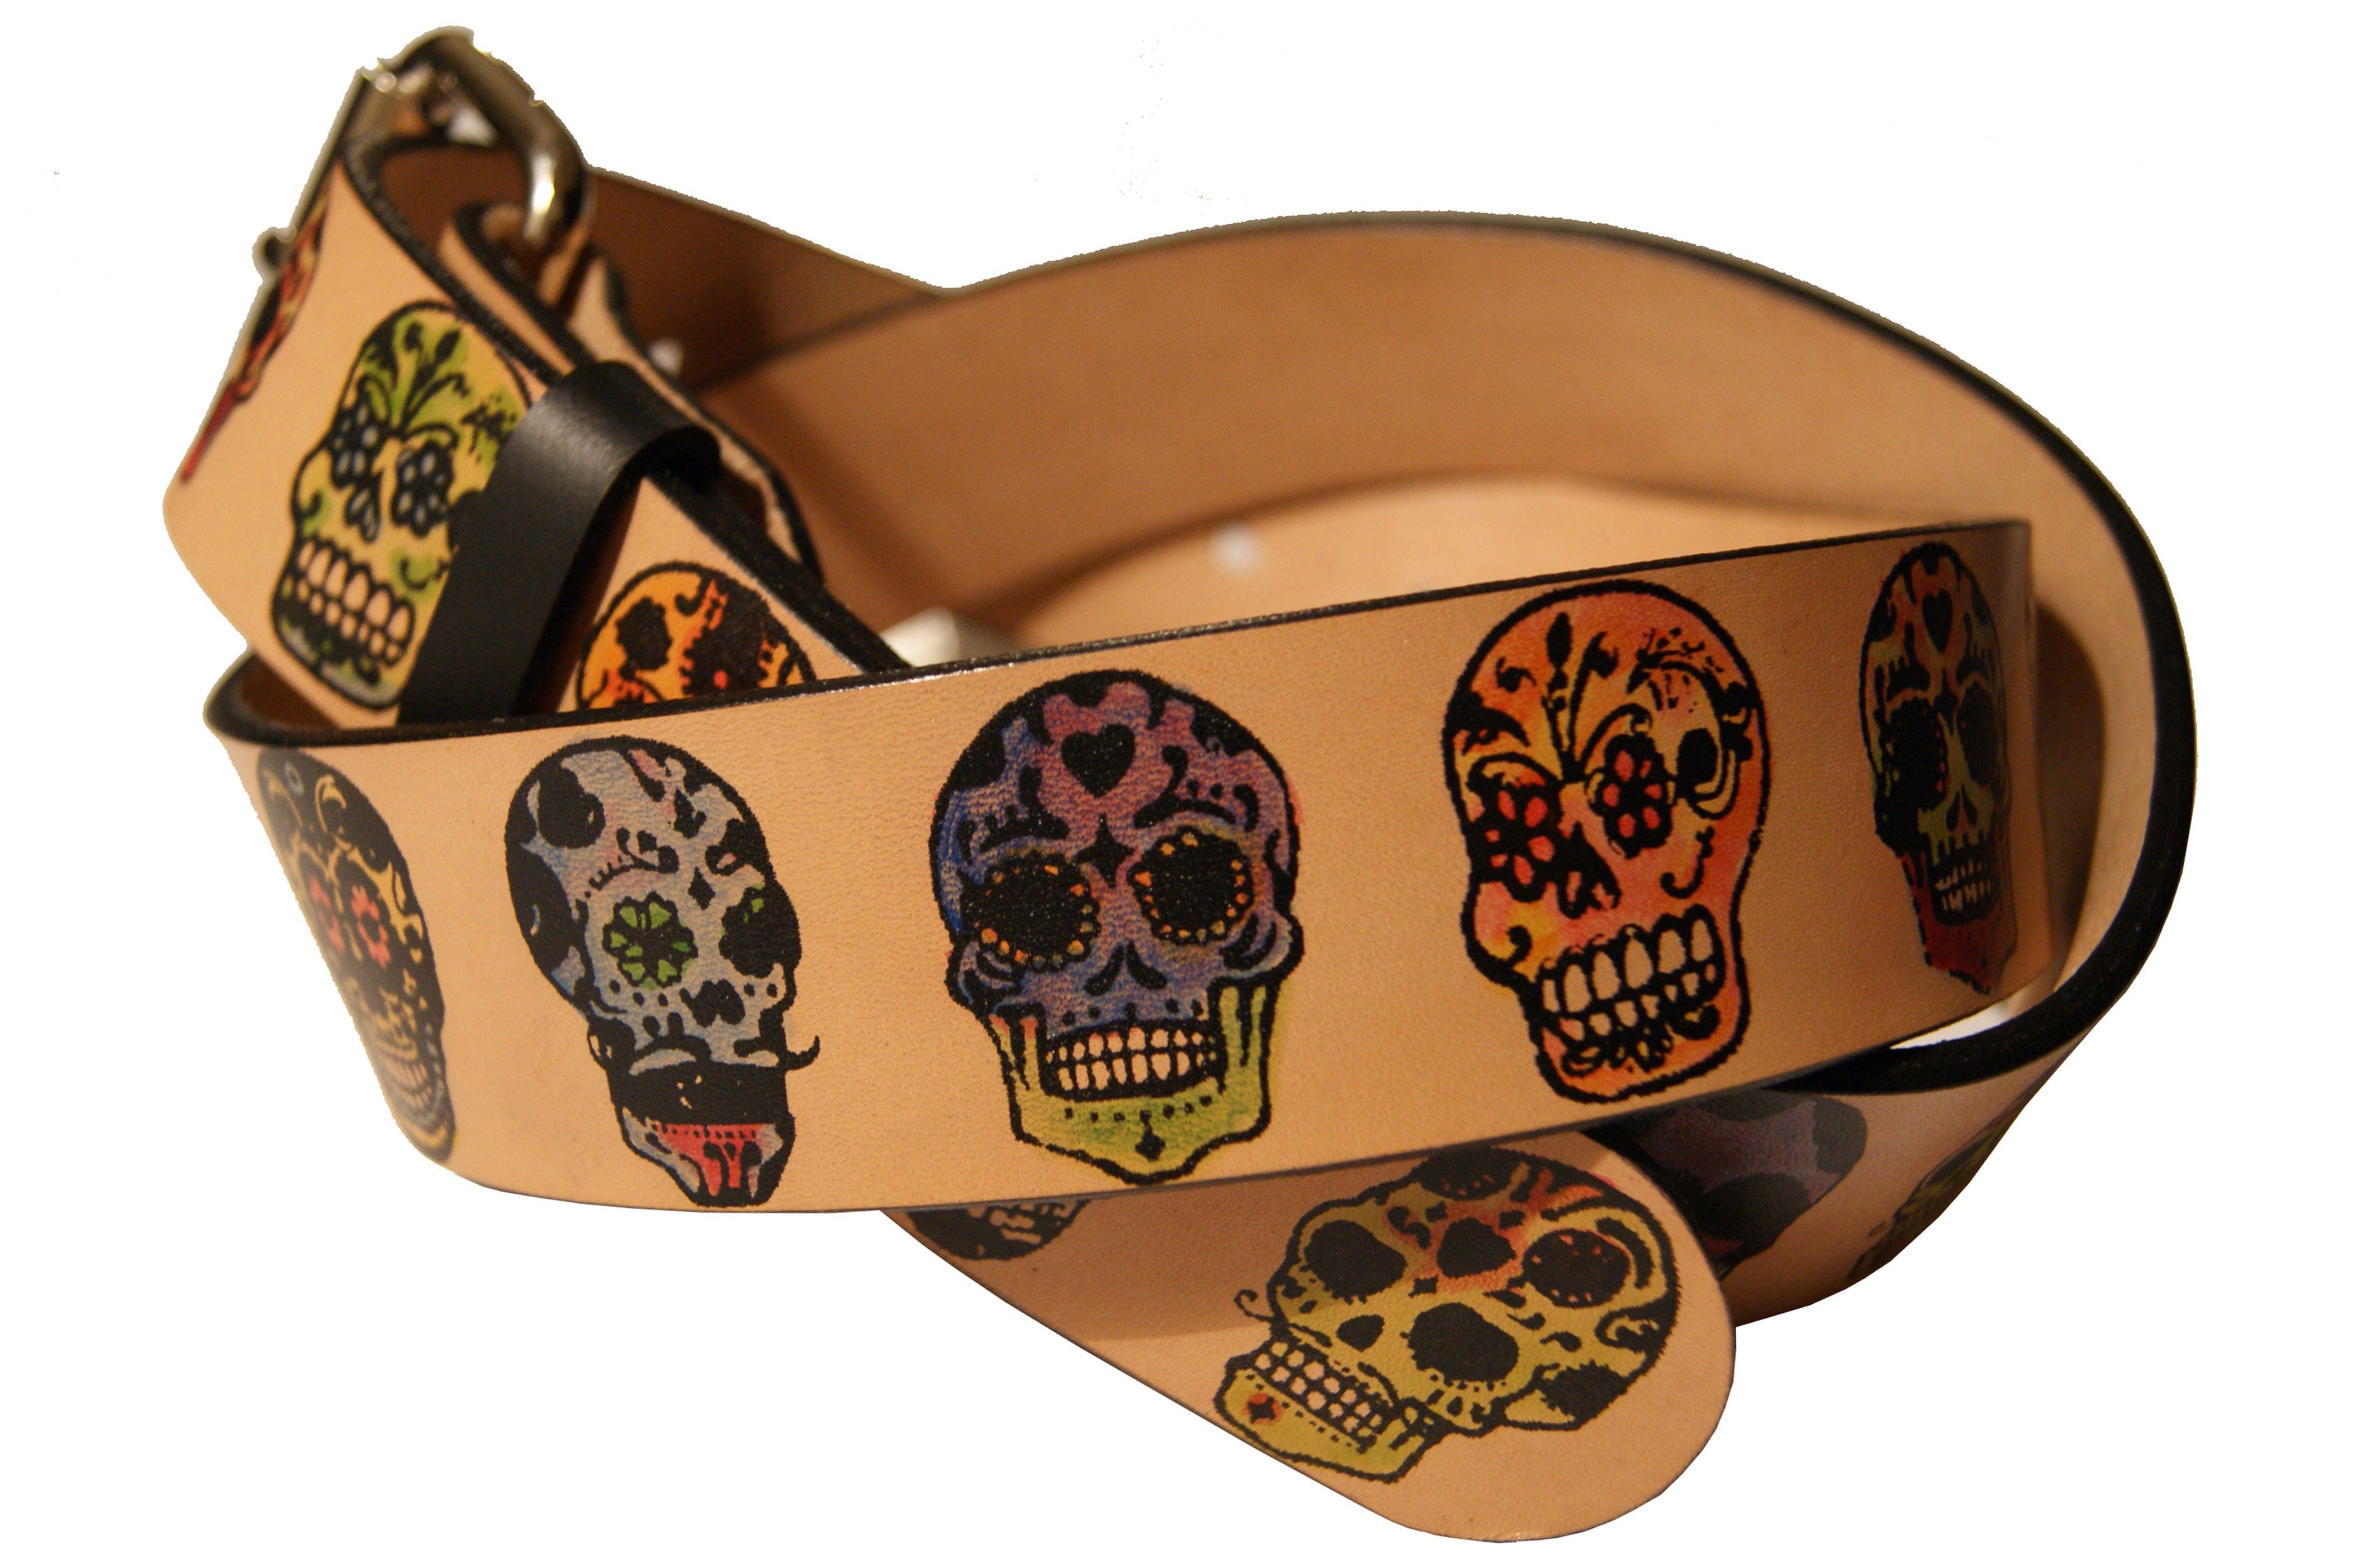 Custom Made Sugar Skulls Day Of The Dead Leather Belt